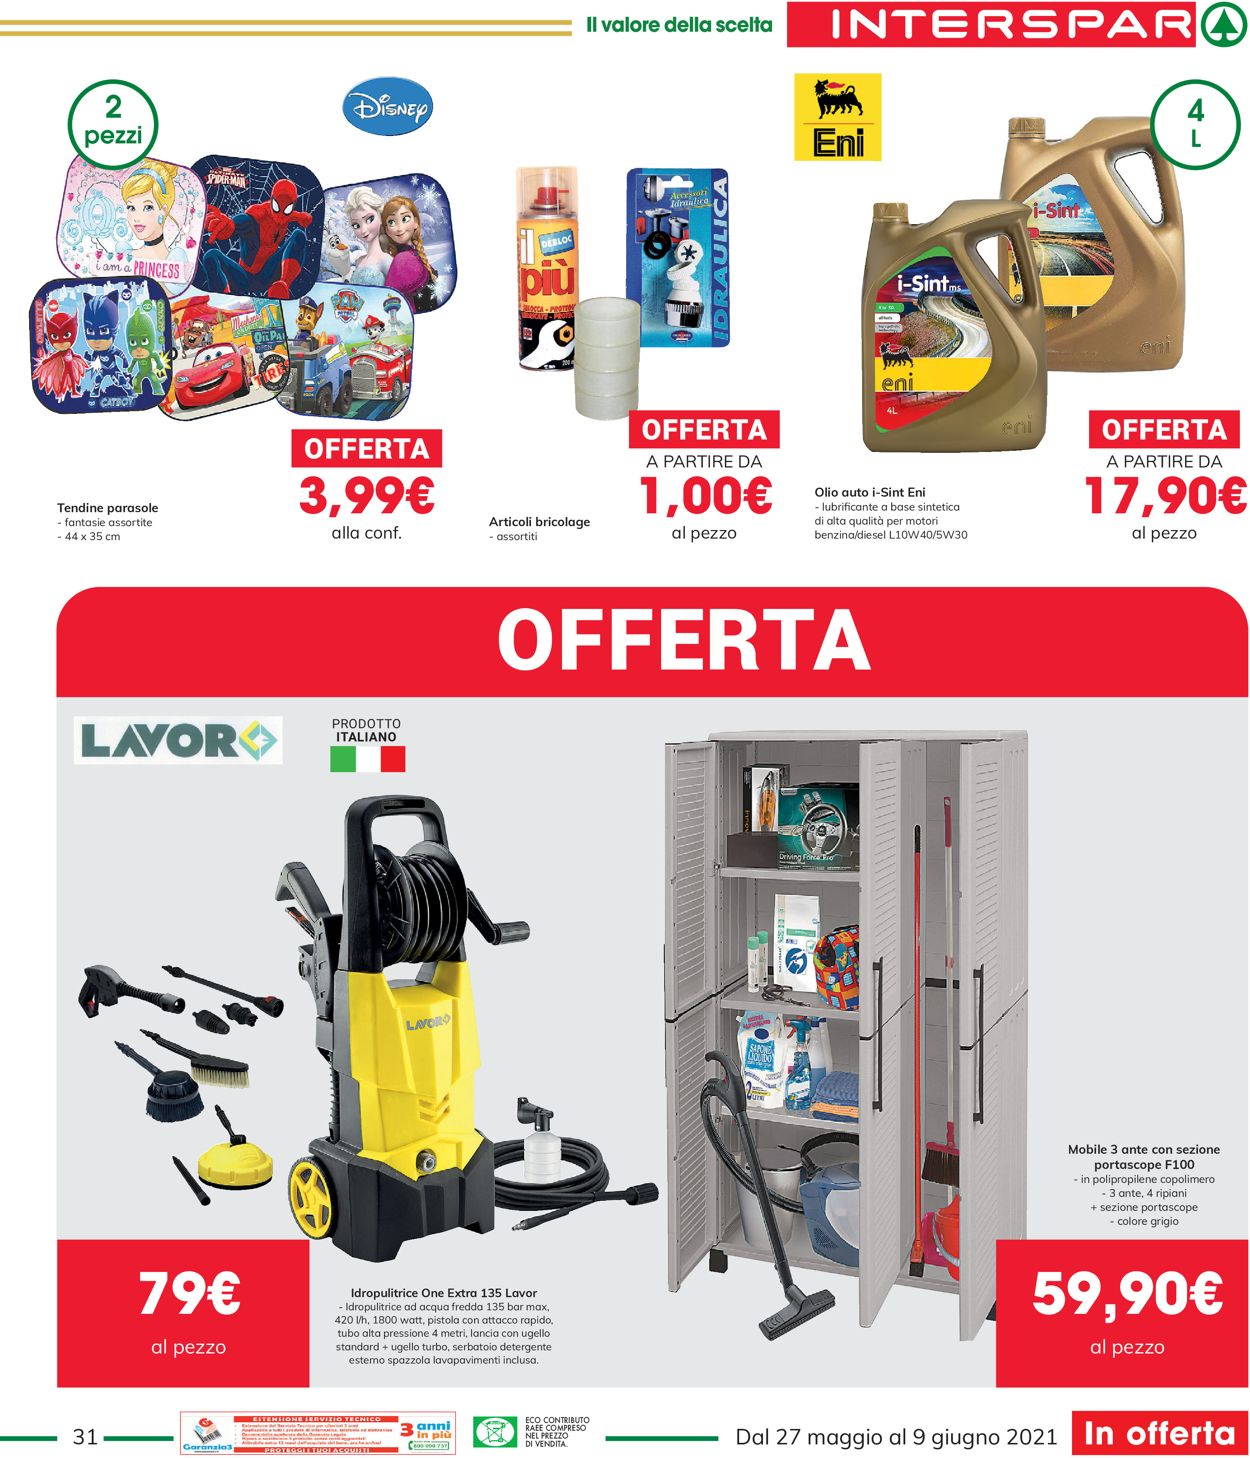 Volantino Interspar - Offerte 27/05-09/06/2021 (Pagina 31)